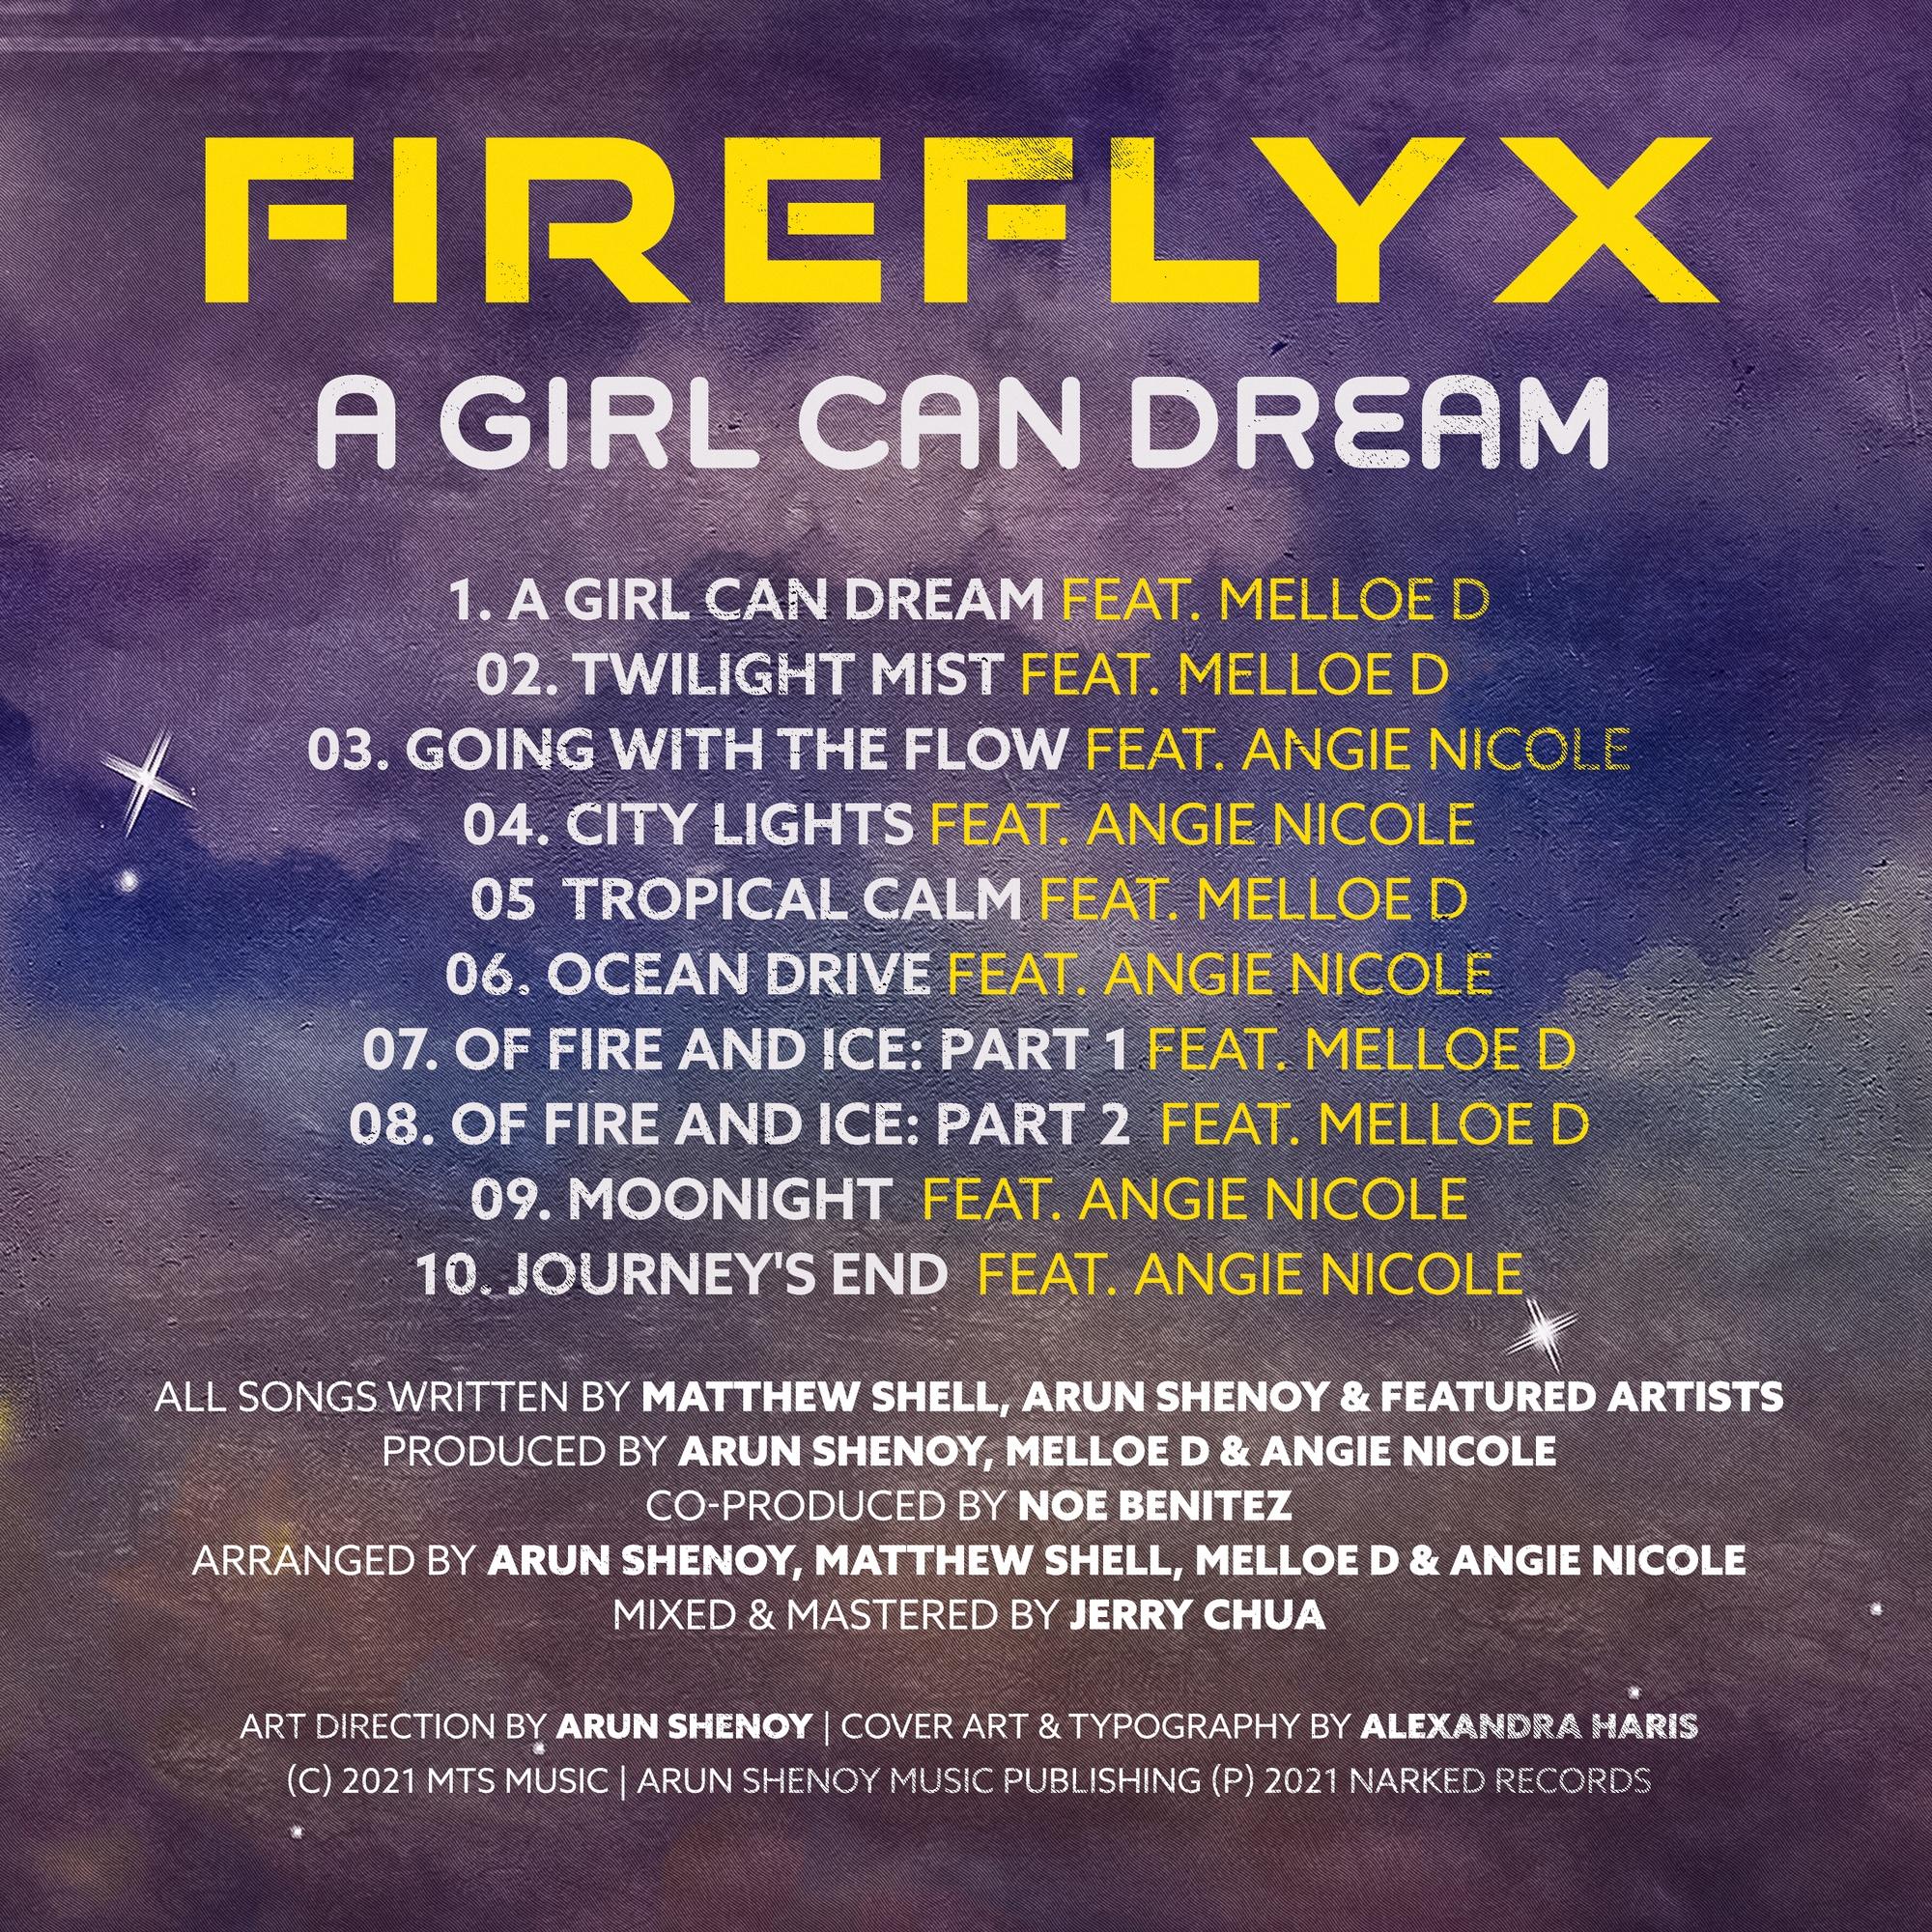 Fireflyx